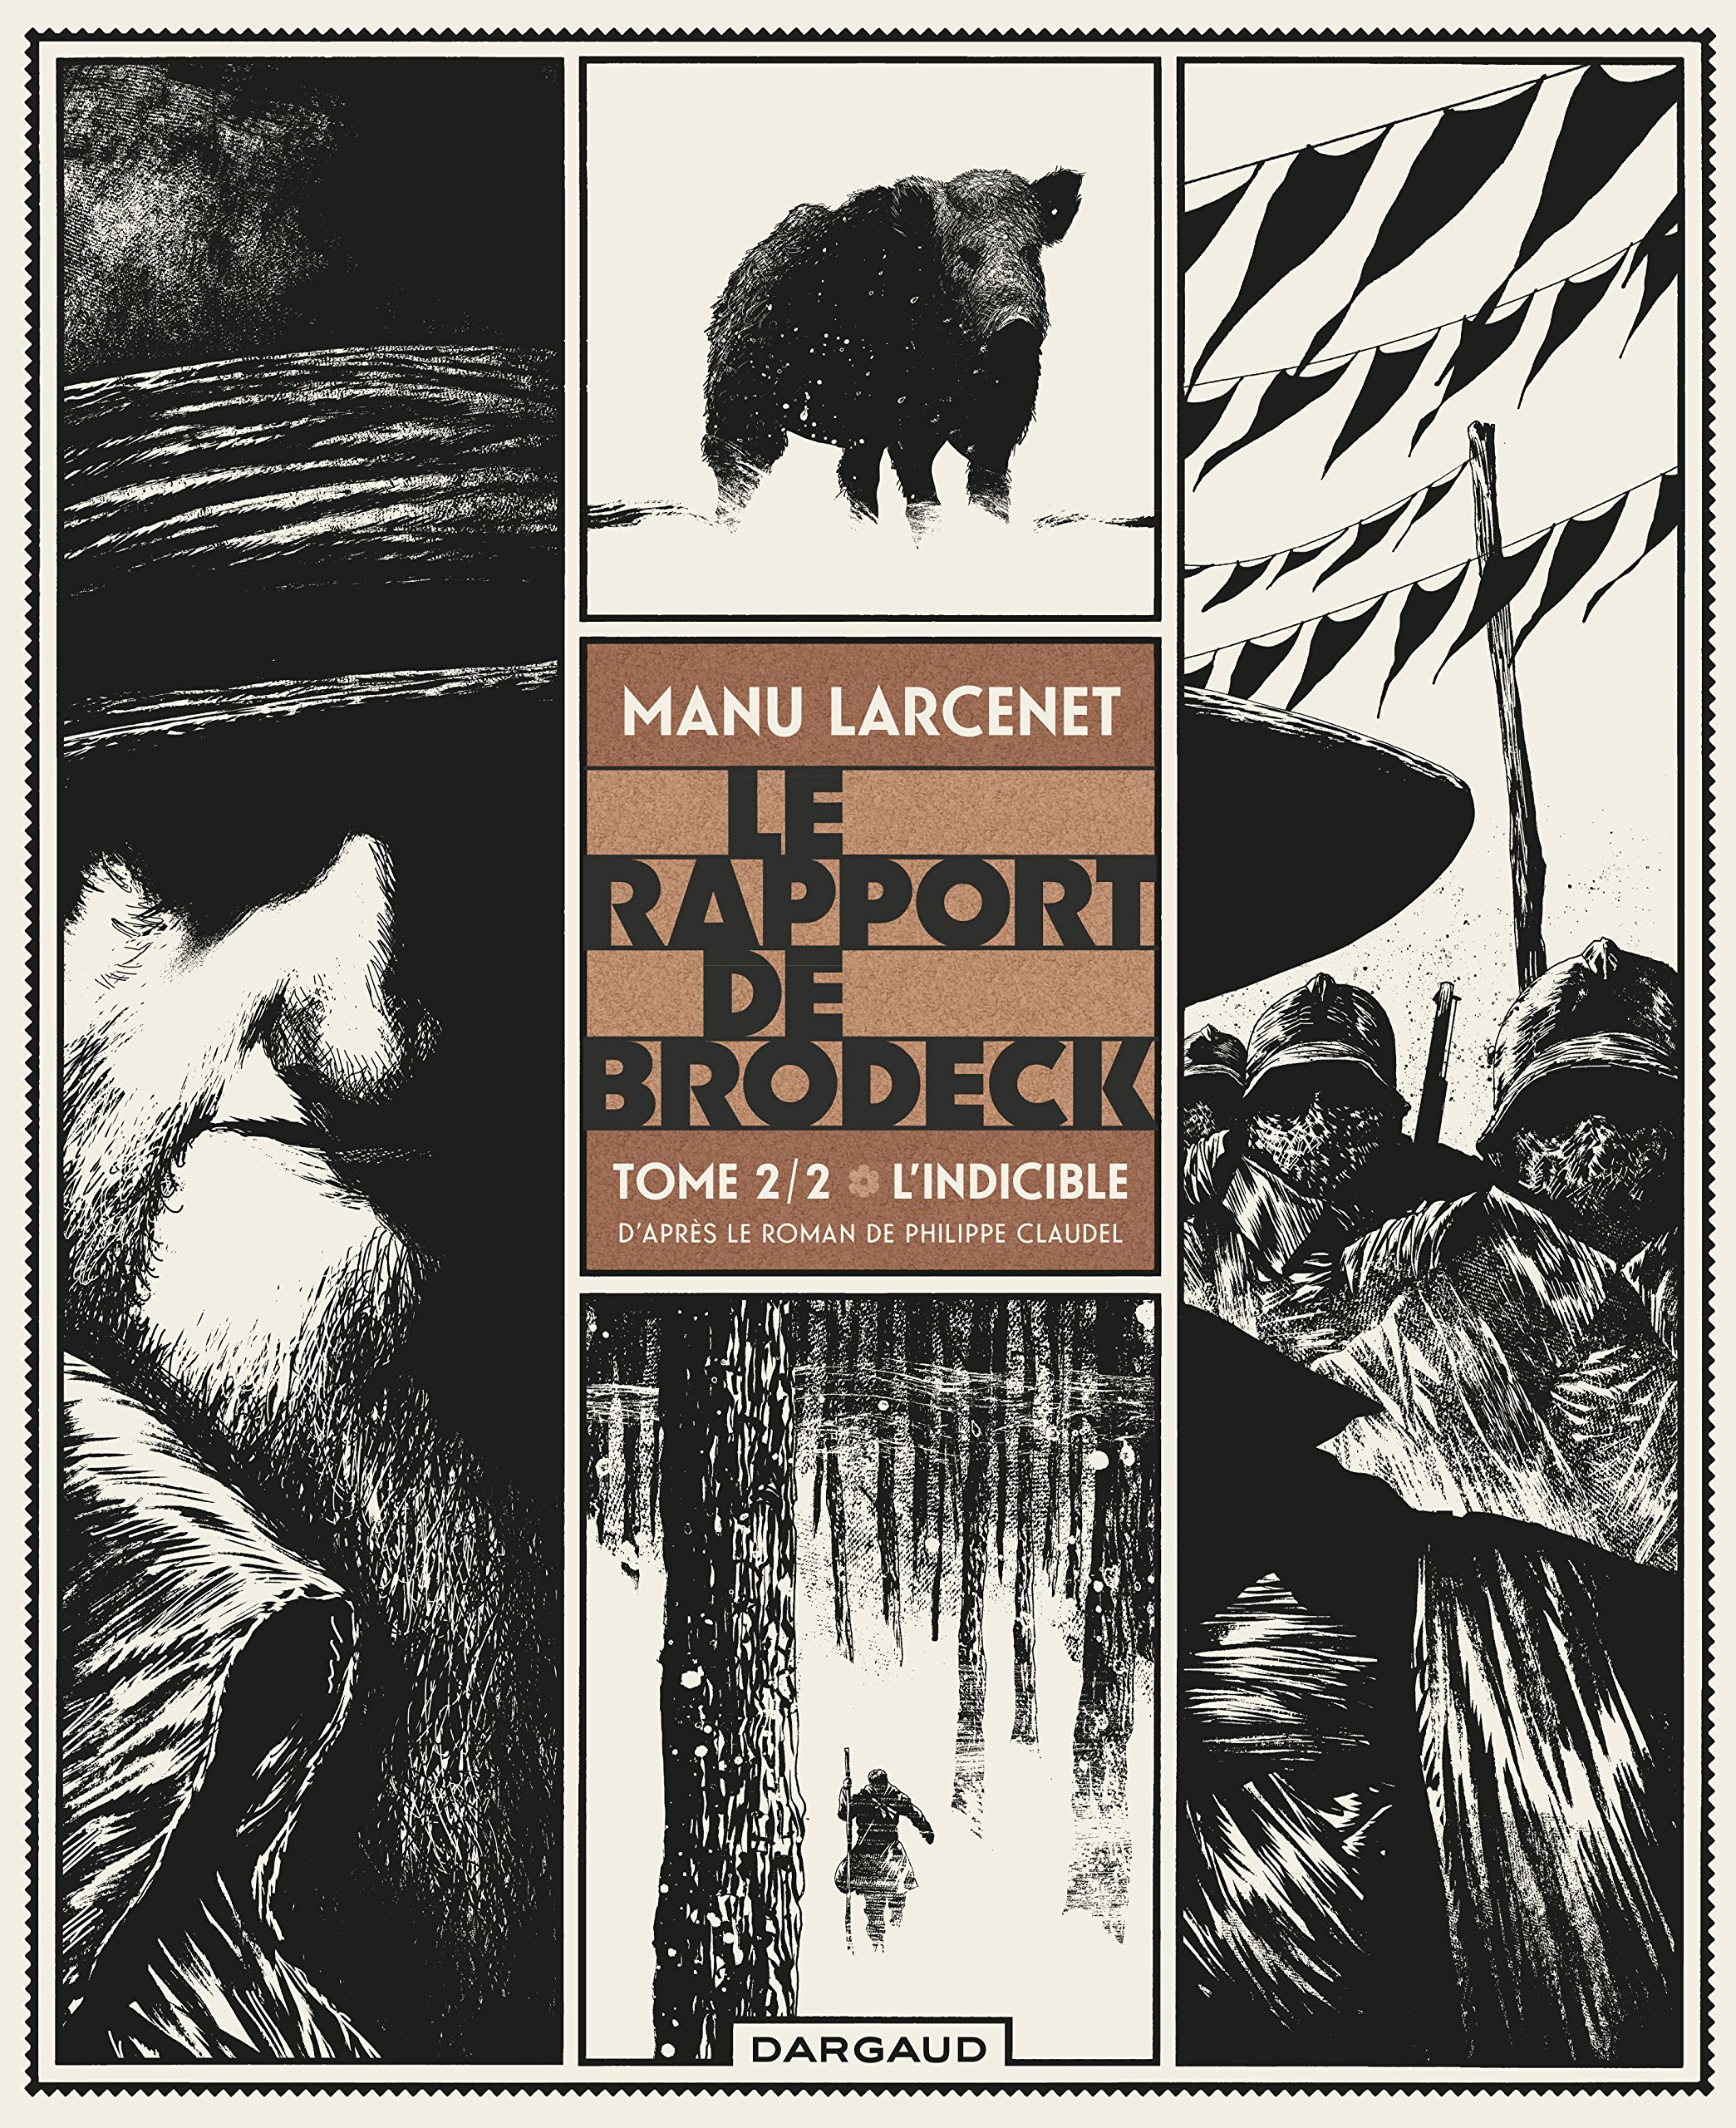 Rapport de Brodeck (Le) - tome 2 - Indicible (L') Album – 17 juin 2016 Larcenet Manu Dargaud 2205075403 Bandes dessinées